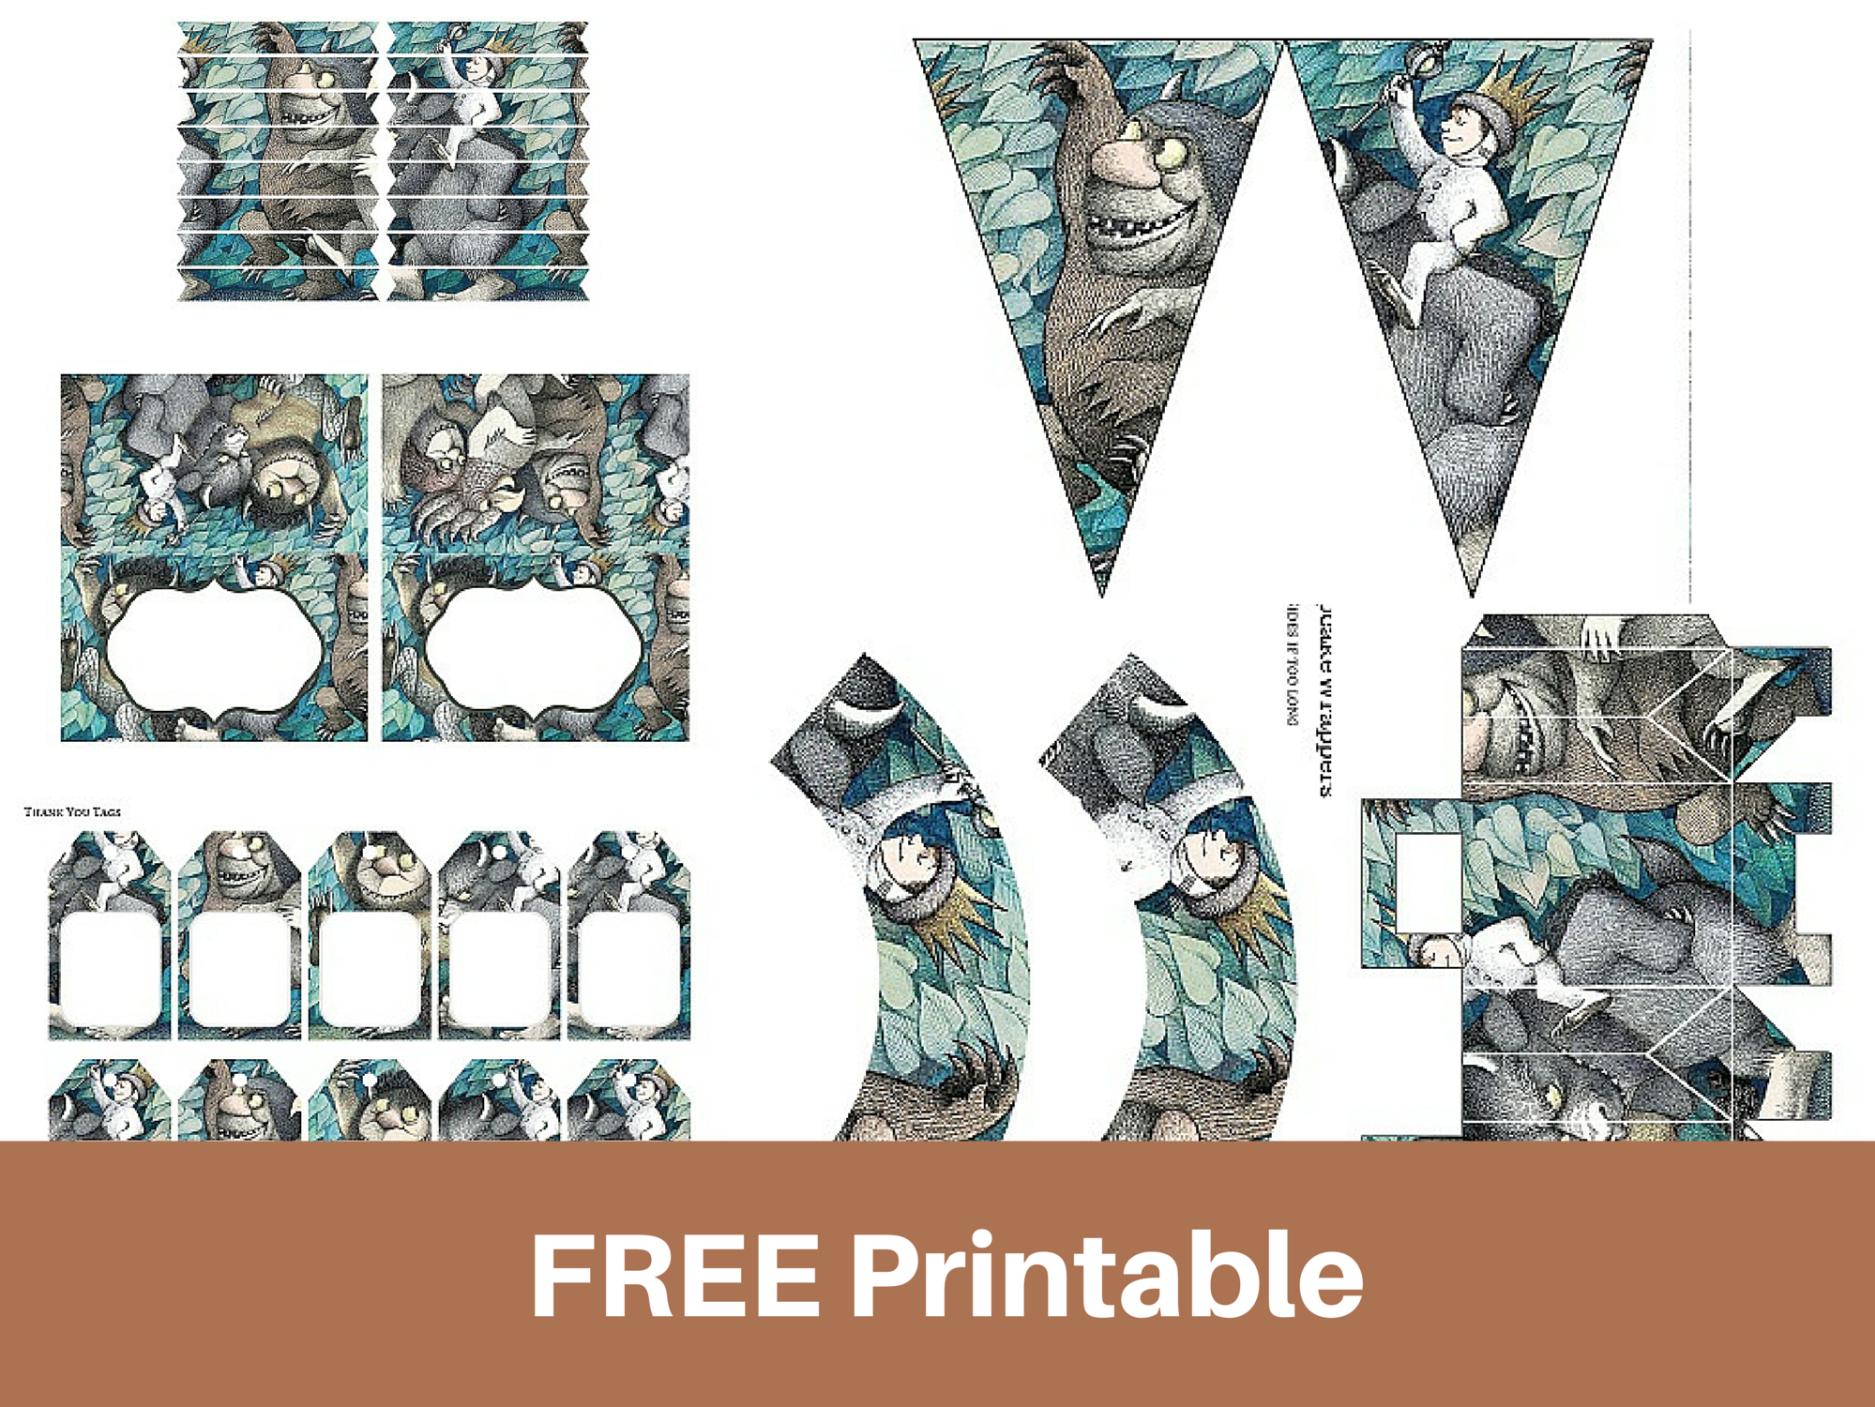 Free Birthday Printables Boy ~ Free printable u201cwhere the wild things areu201d baby shower birthday